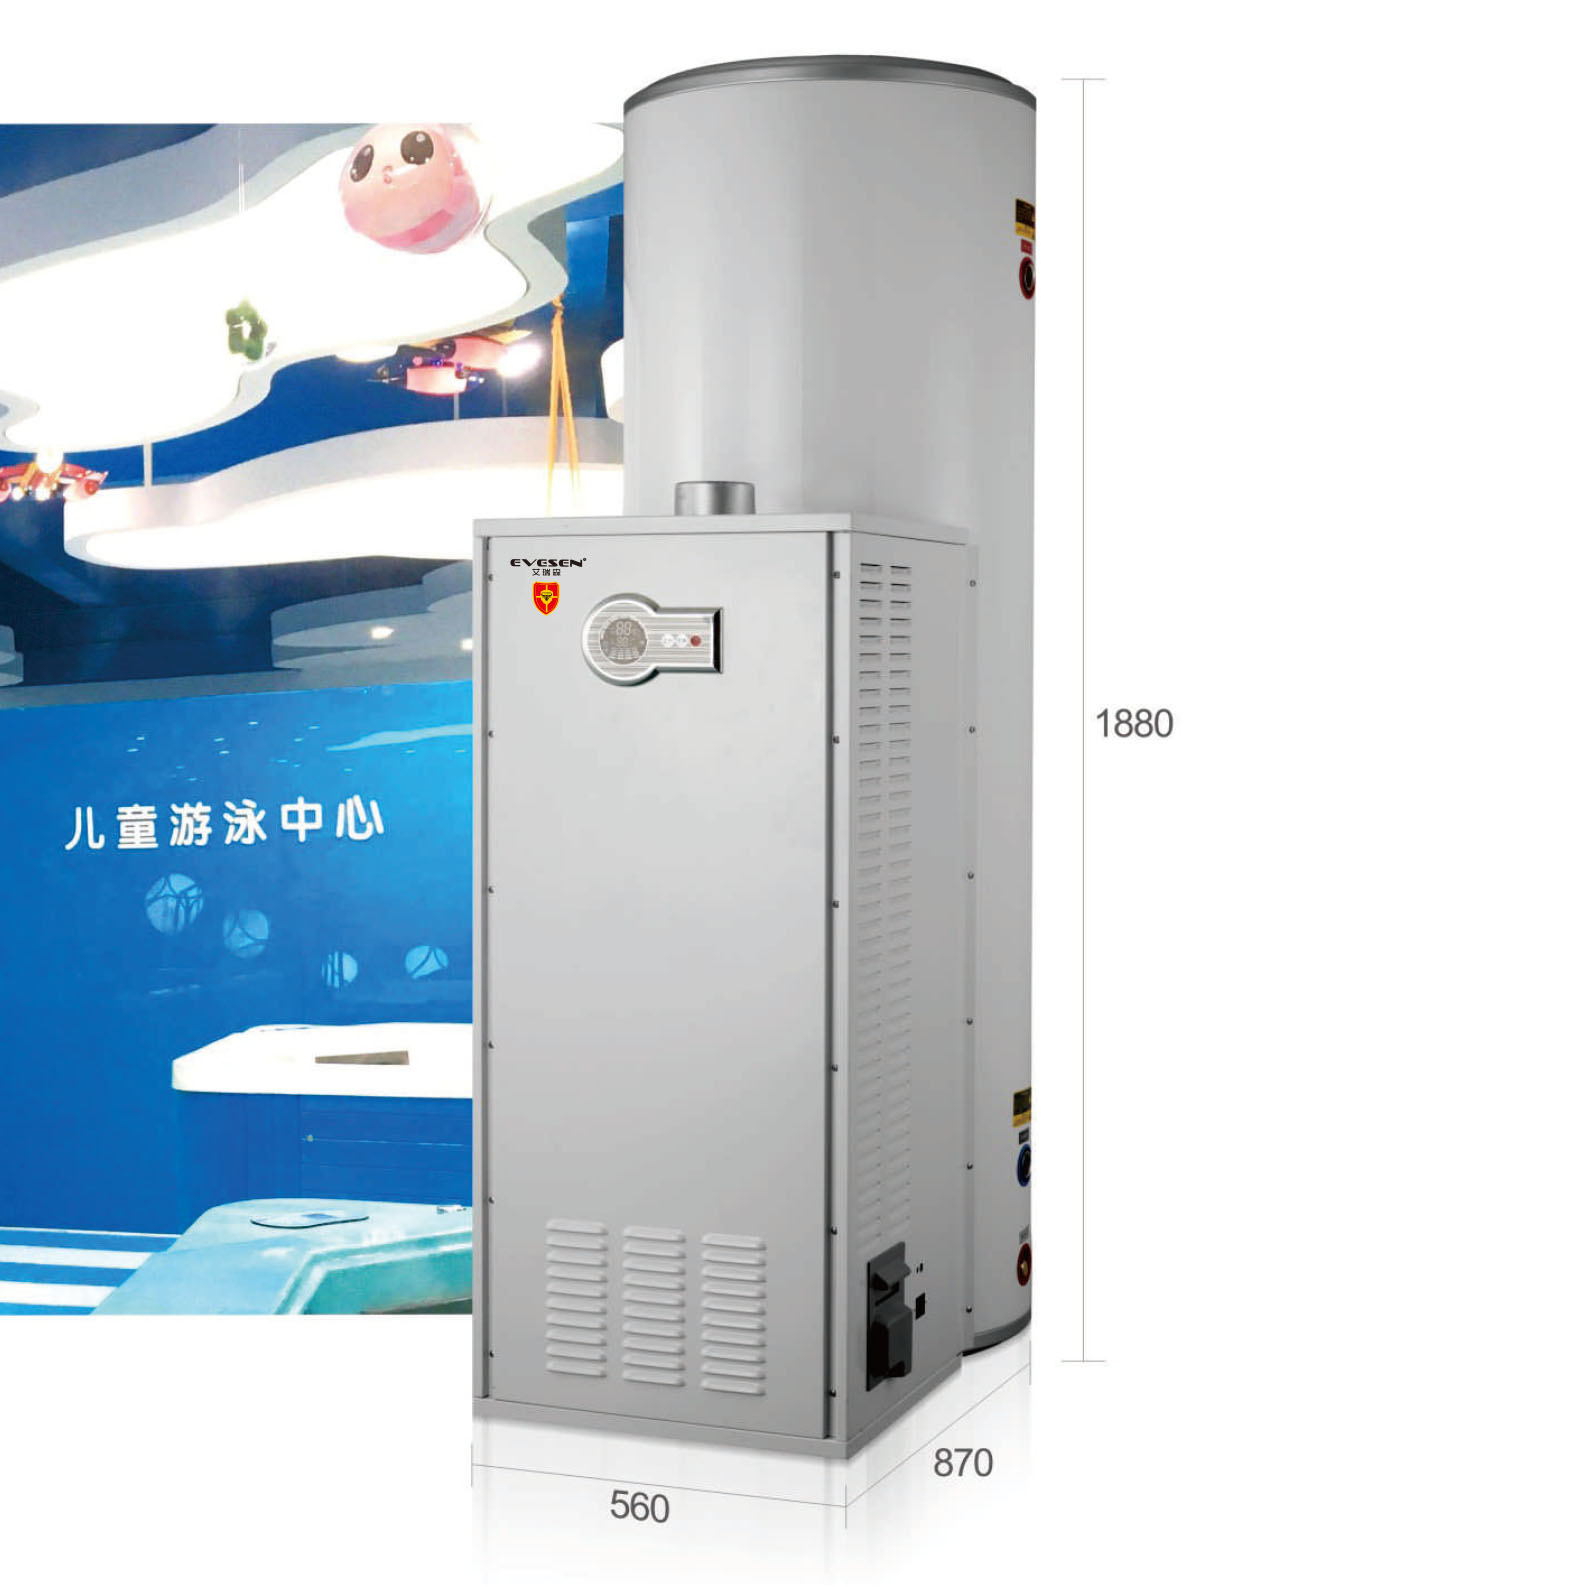 320-500kw采暖热水炉